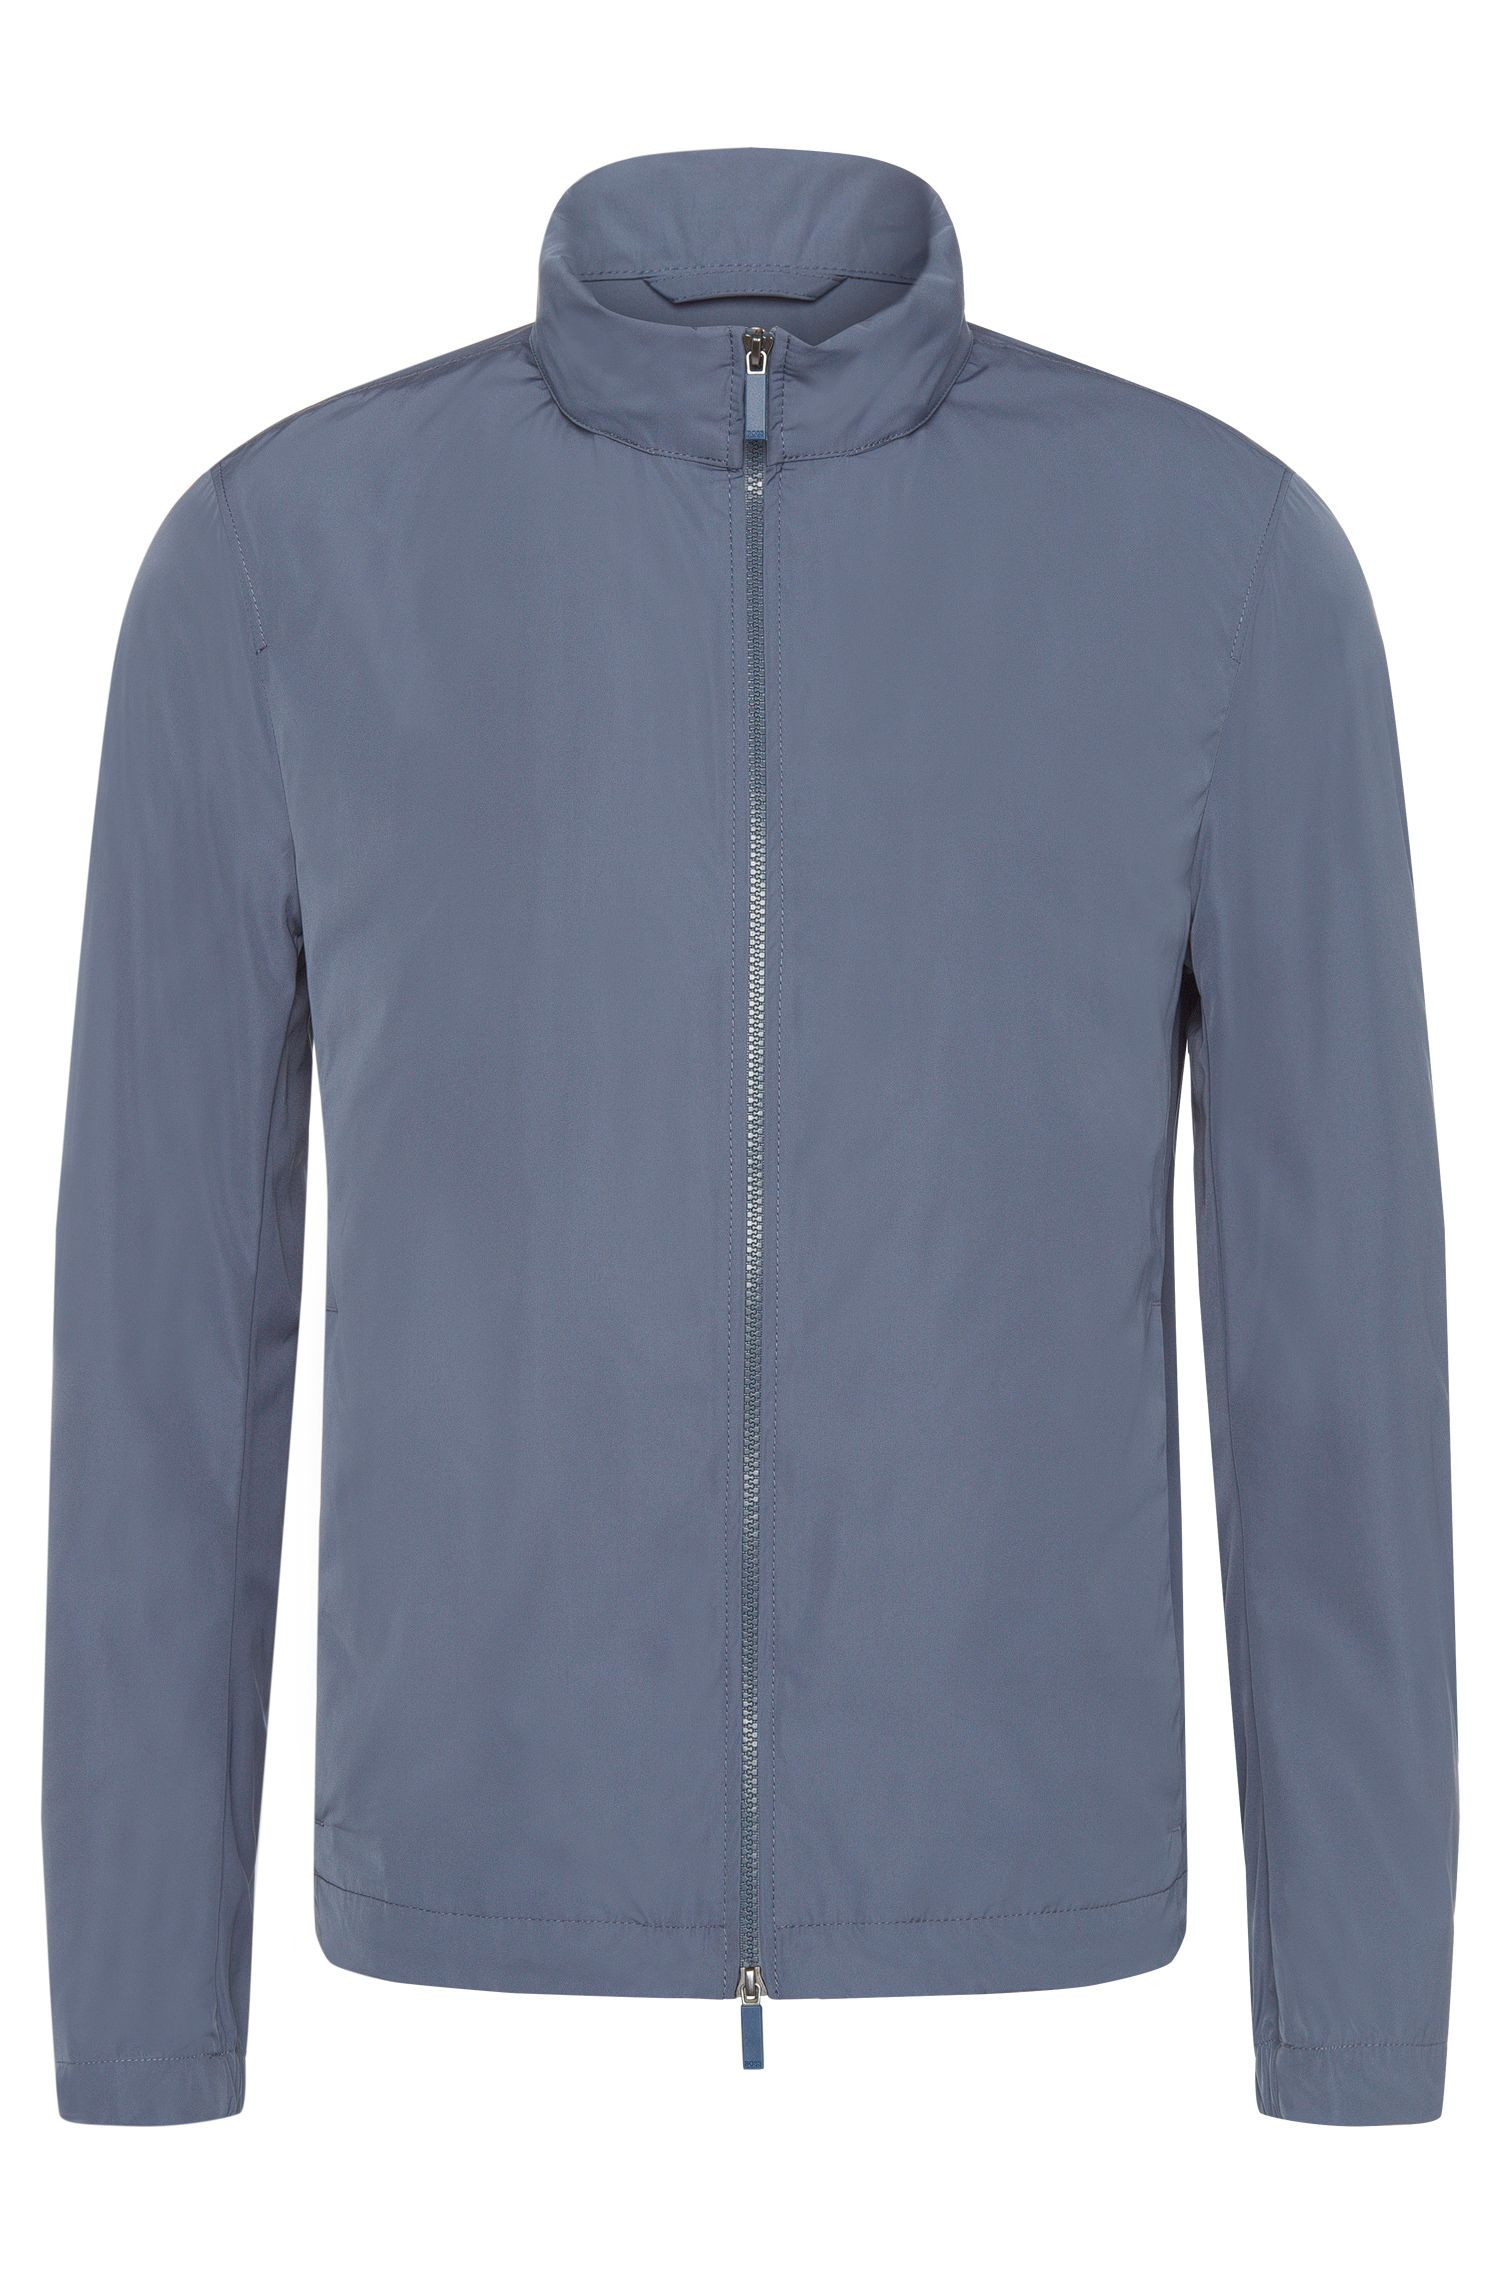 Waterafstotende jas met geïntegreerde capuchon: 'Carpio1'